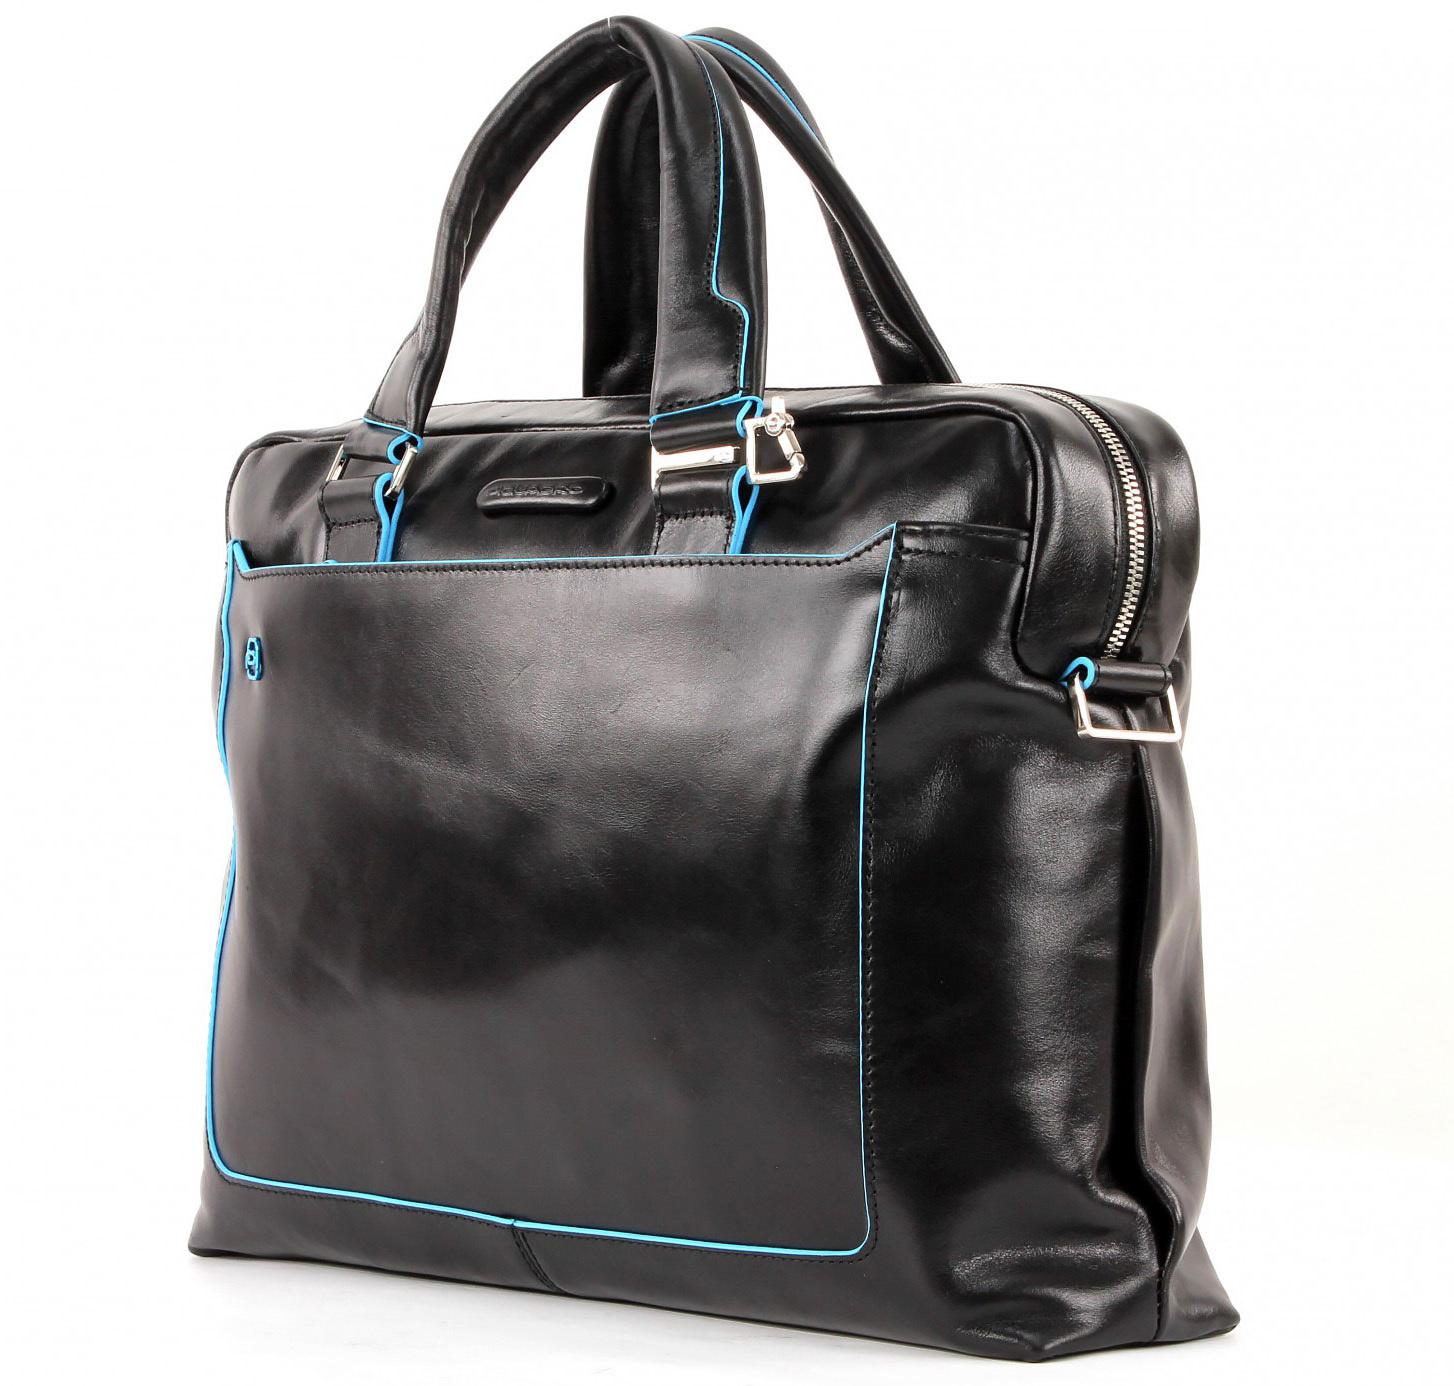 Сумка Piquadro Blue Square, цвет черный, 38,5x27x8,5 см (CA3335B2/N)